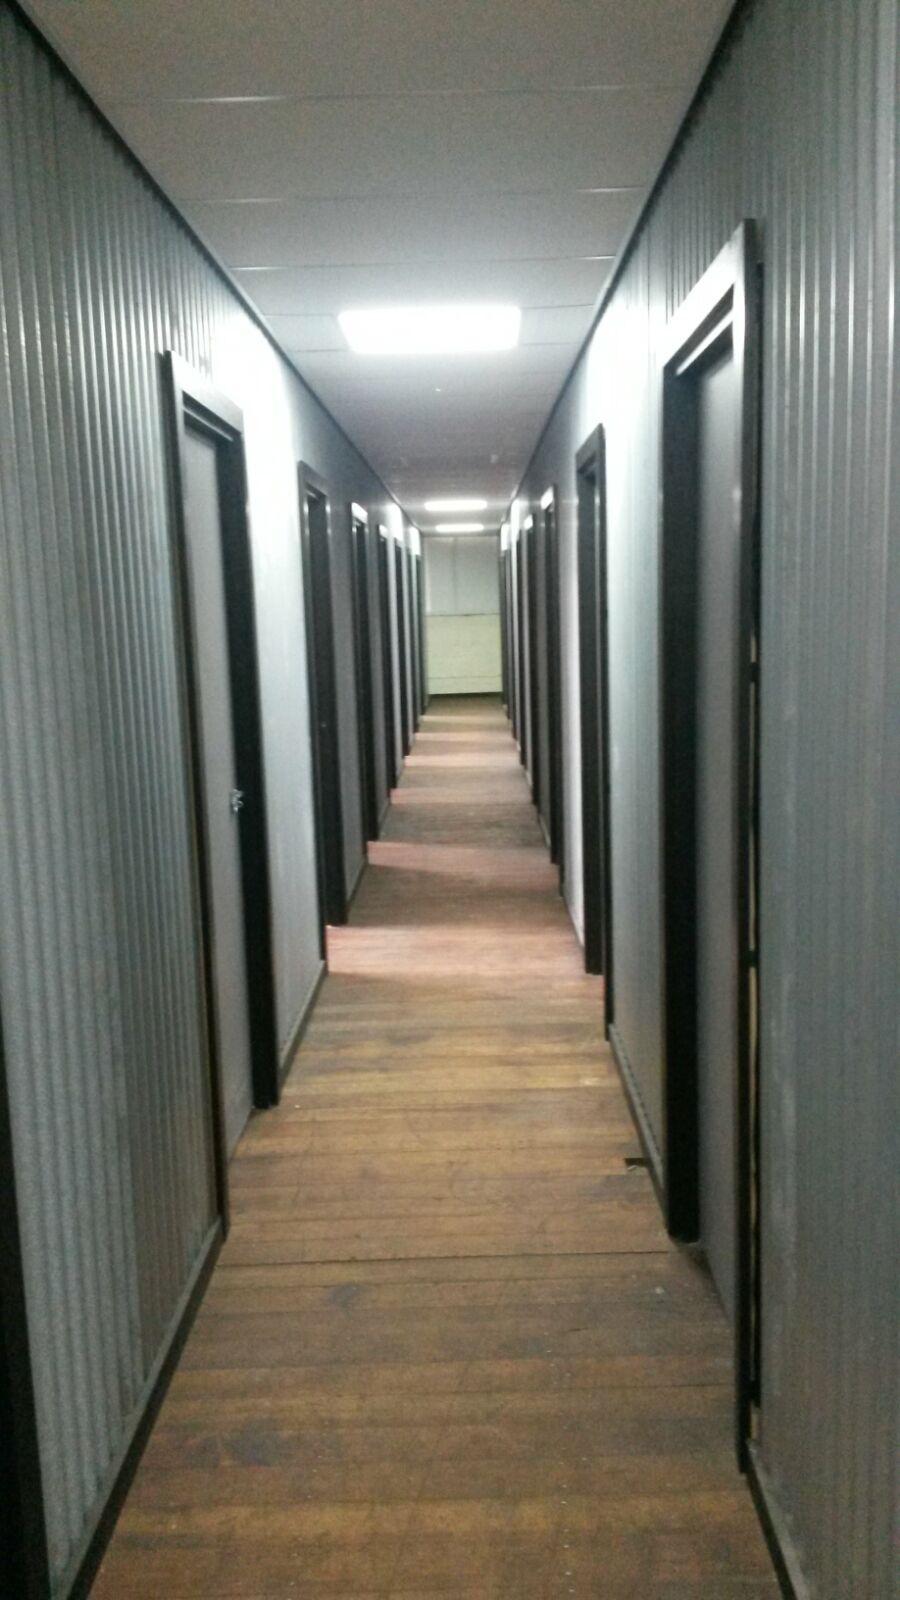 Britannia Mills Storage Co. - FREE MAN&VAN move in - NO DEPOSIT a storage company in Cobden Street, Bury, UK